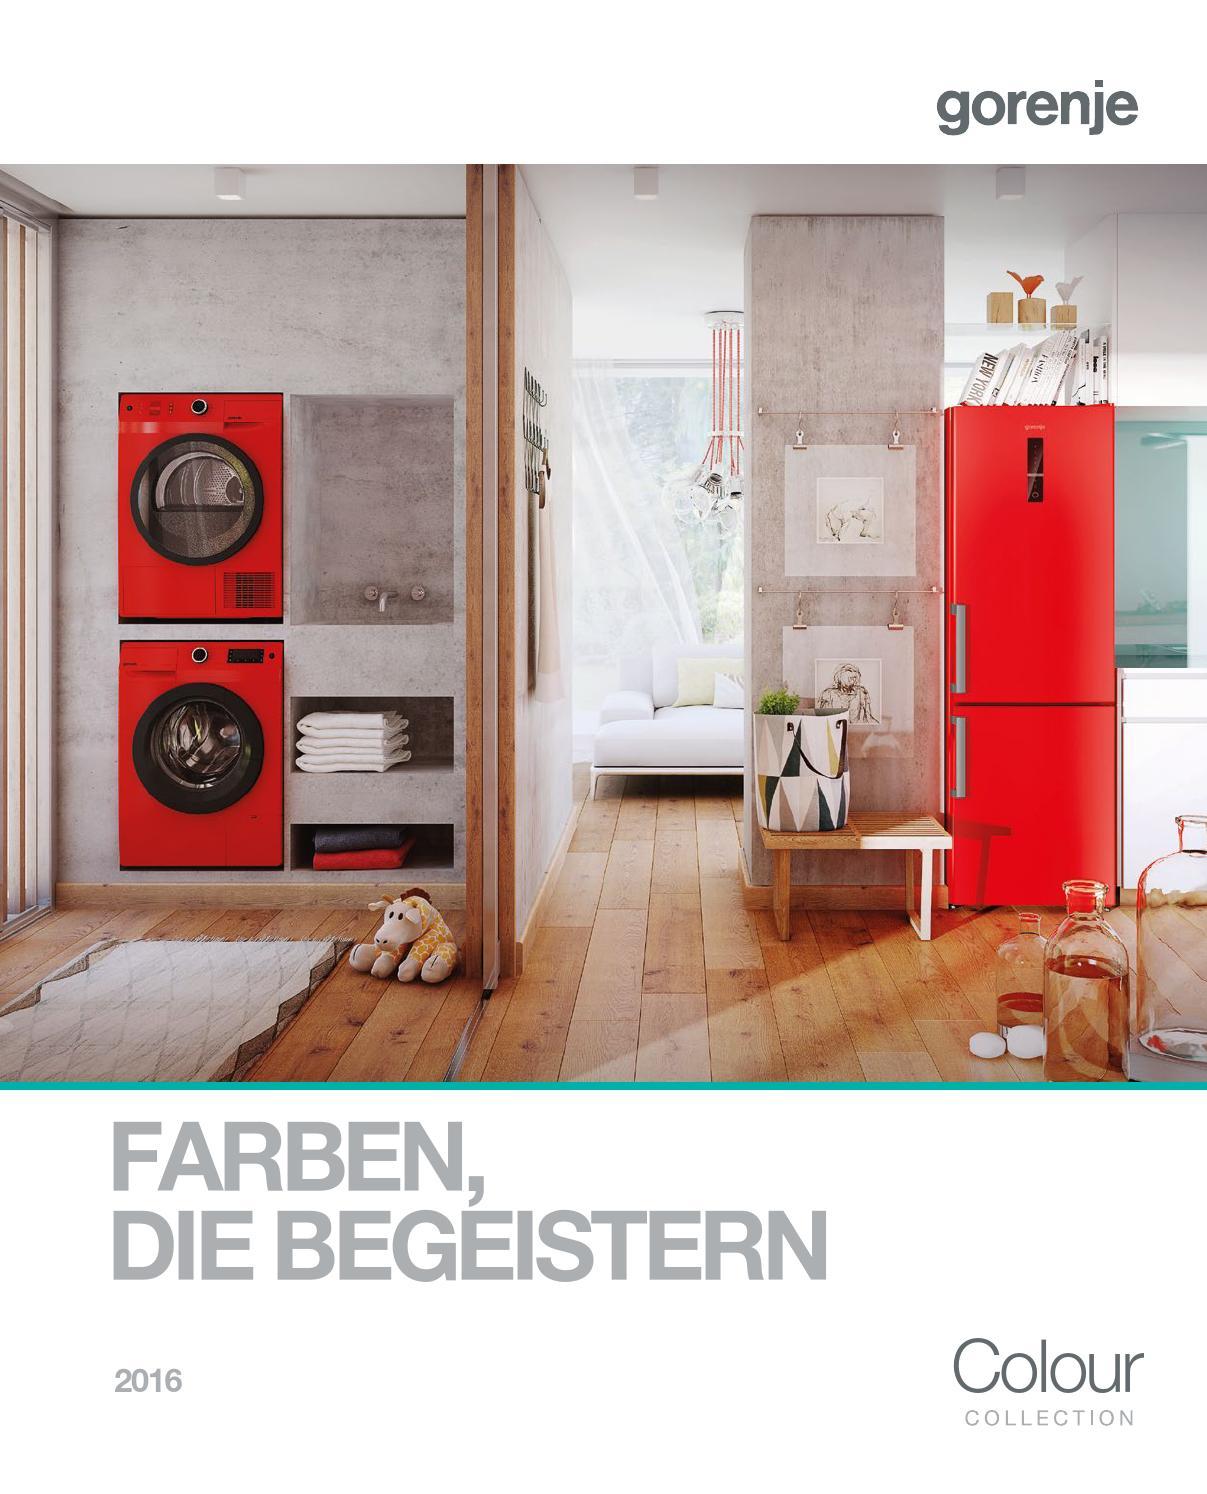 Wandfarbe Farbpalette Toom Eine Graue Farbpalette: Image Farbbroschure 2016 By Gorenje D.o.o.